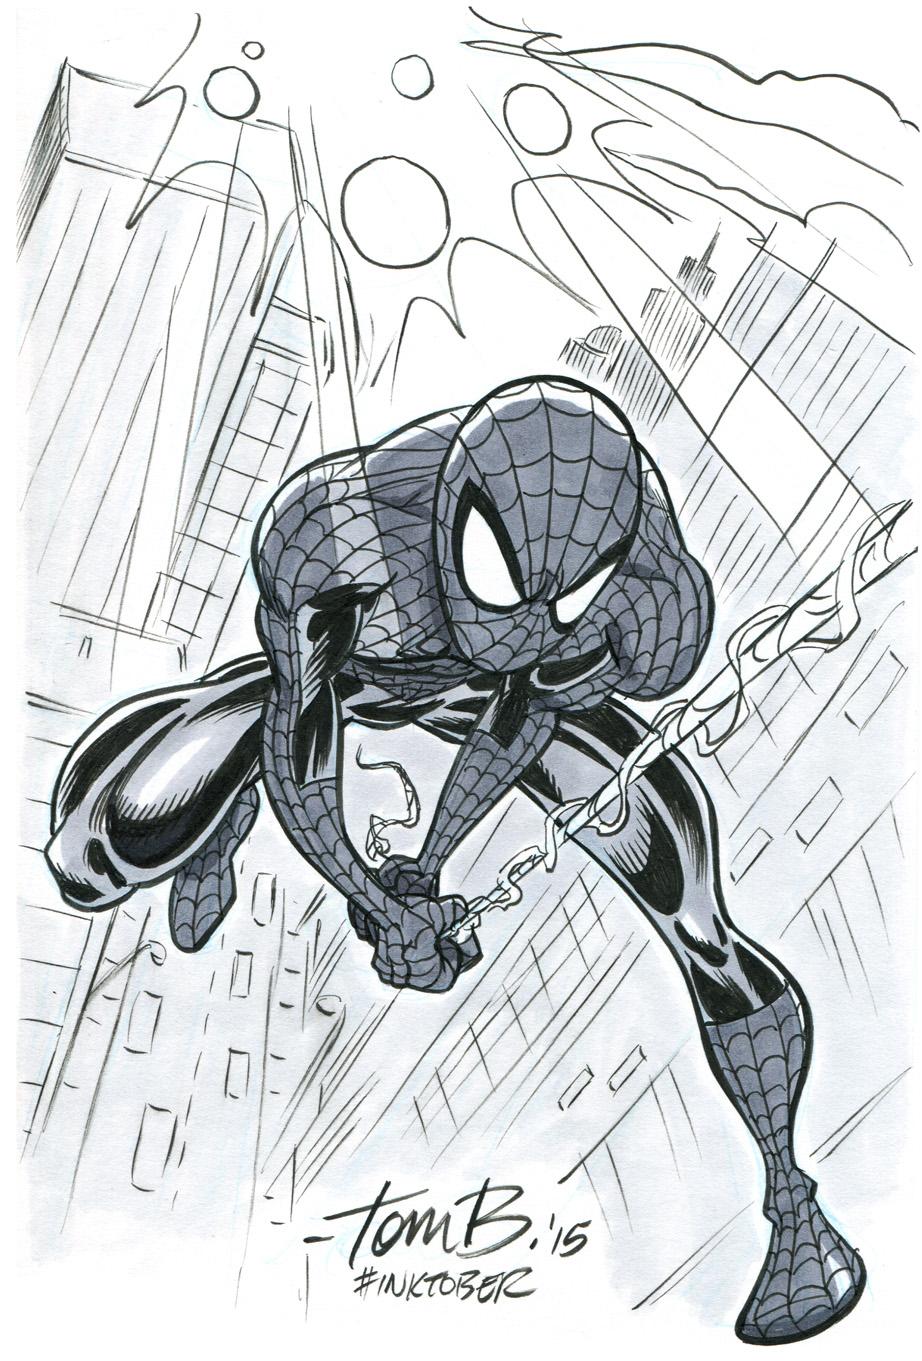 SpiderMan_Inktober_Bancroft.jpg